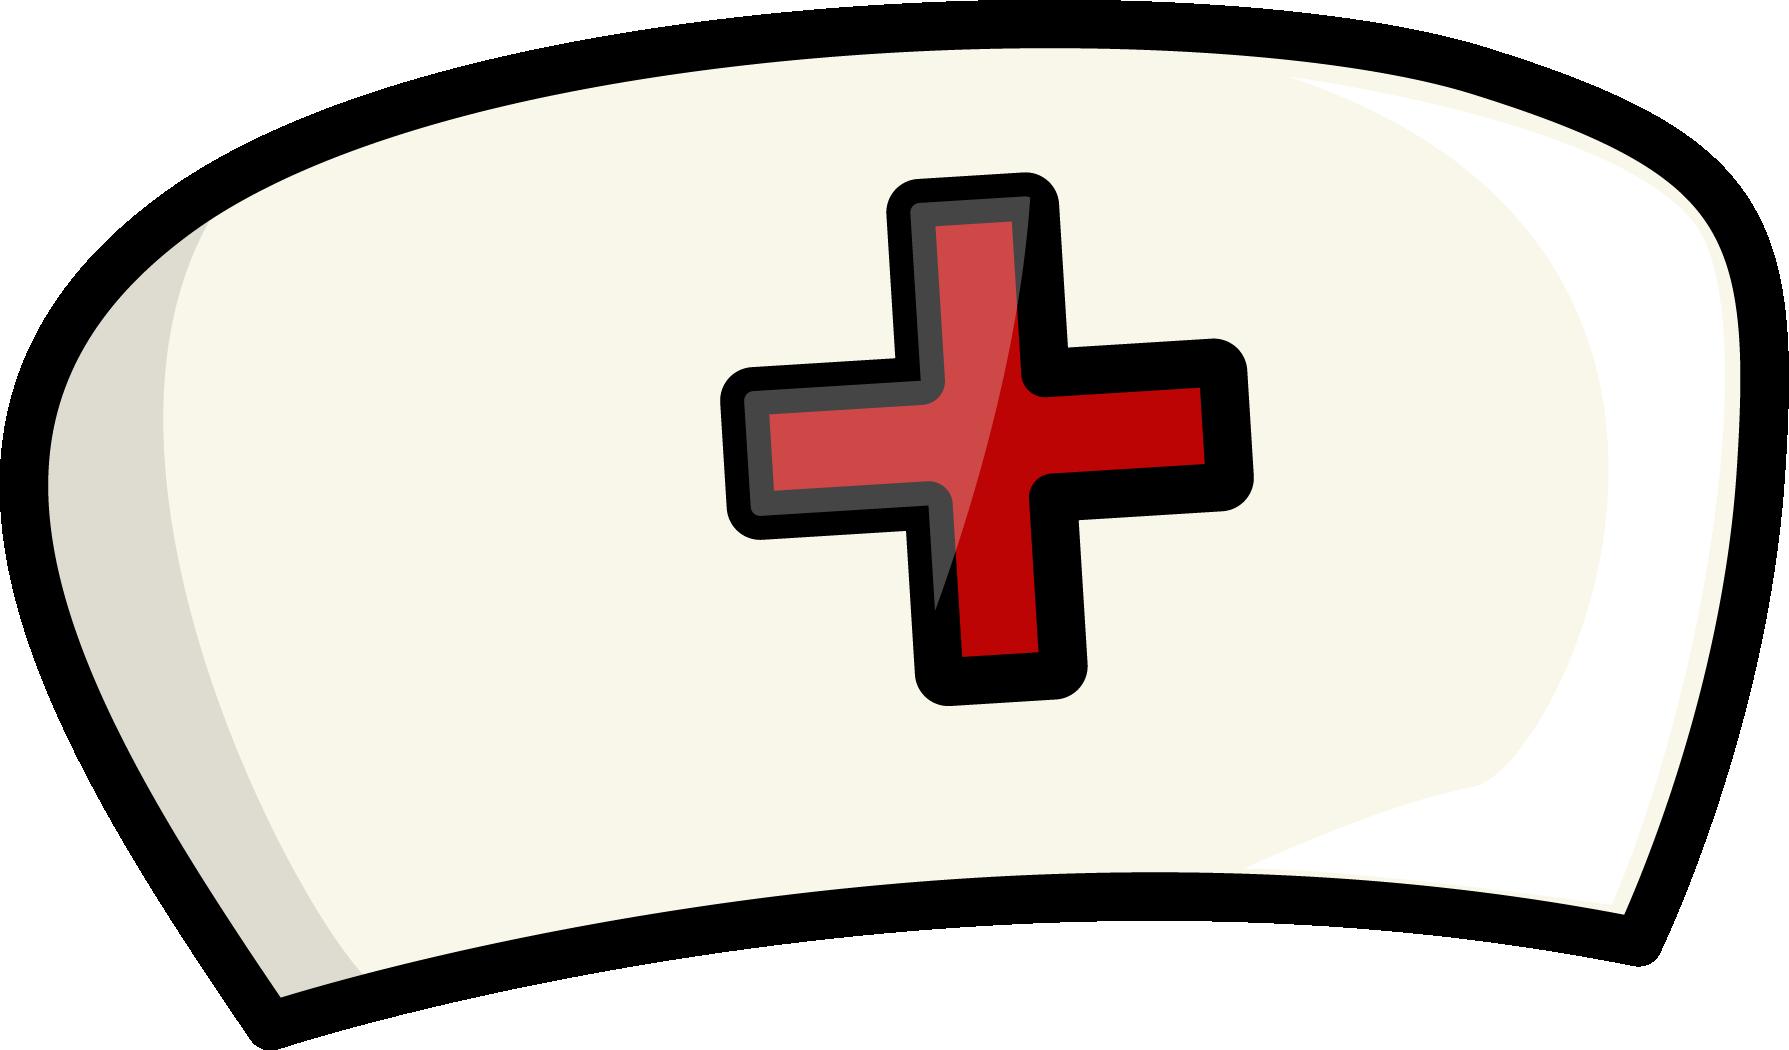 Cartoon nurses cap illustration. Nursing clipart nurse symbol